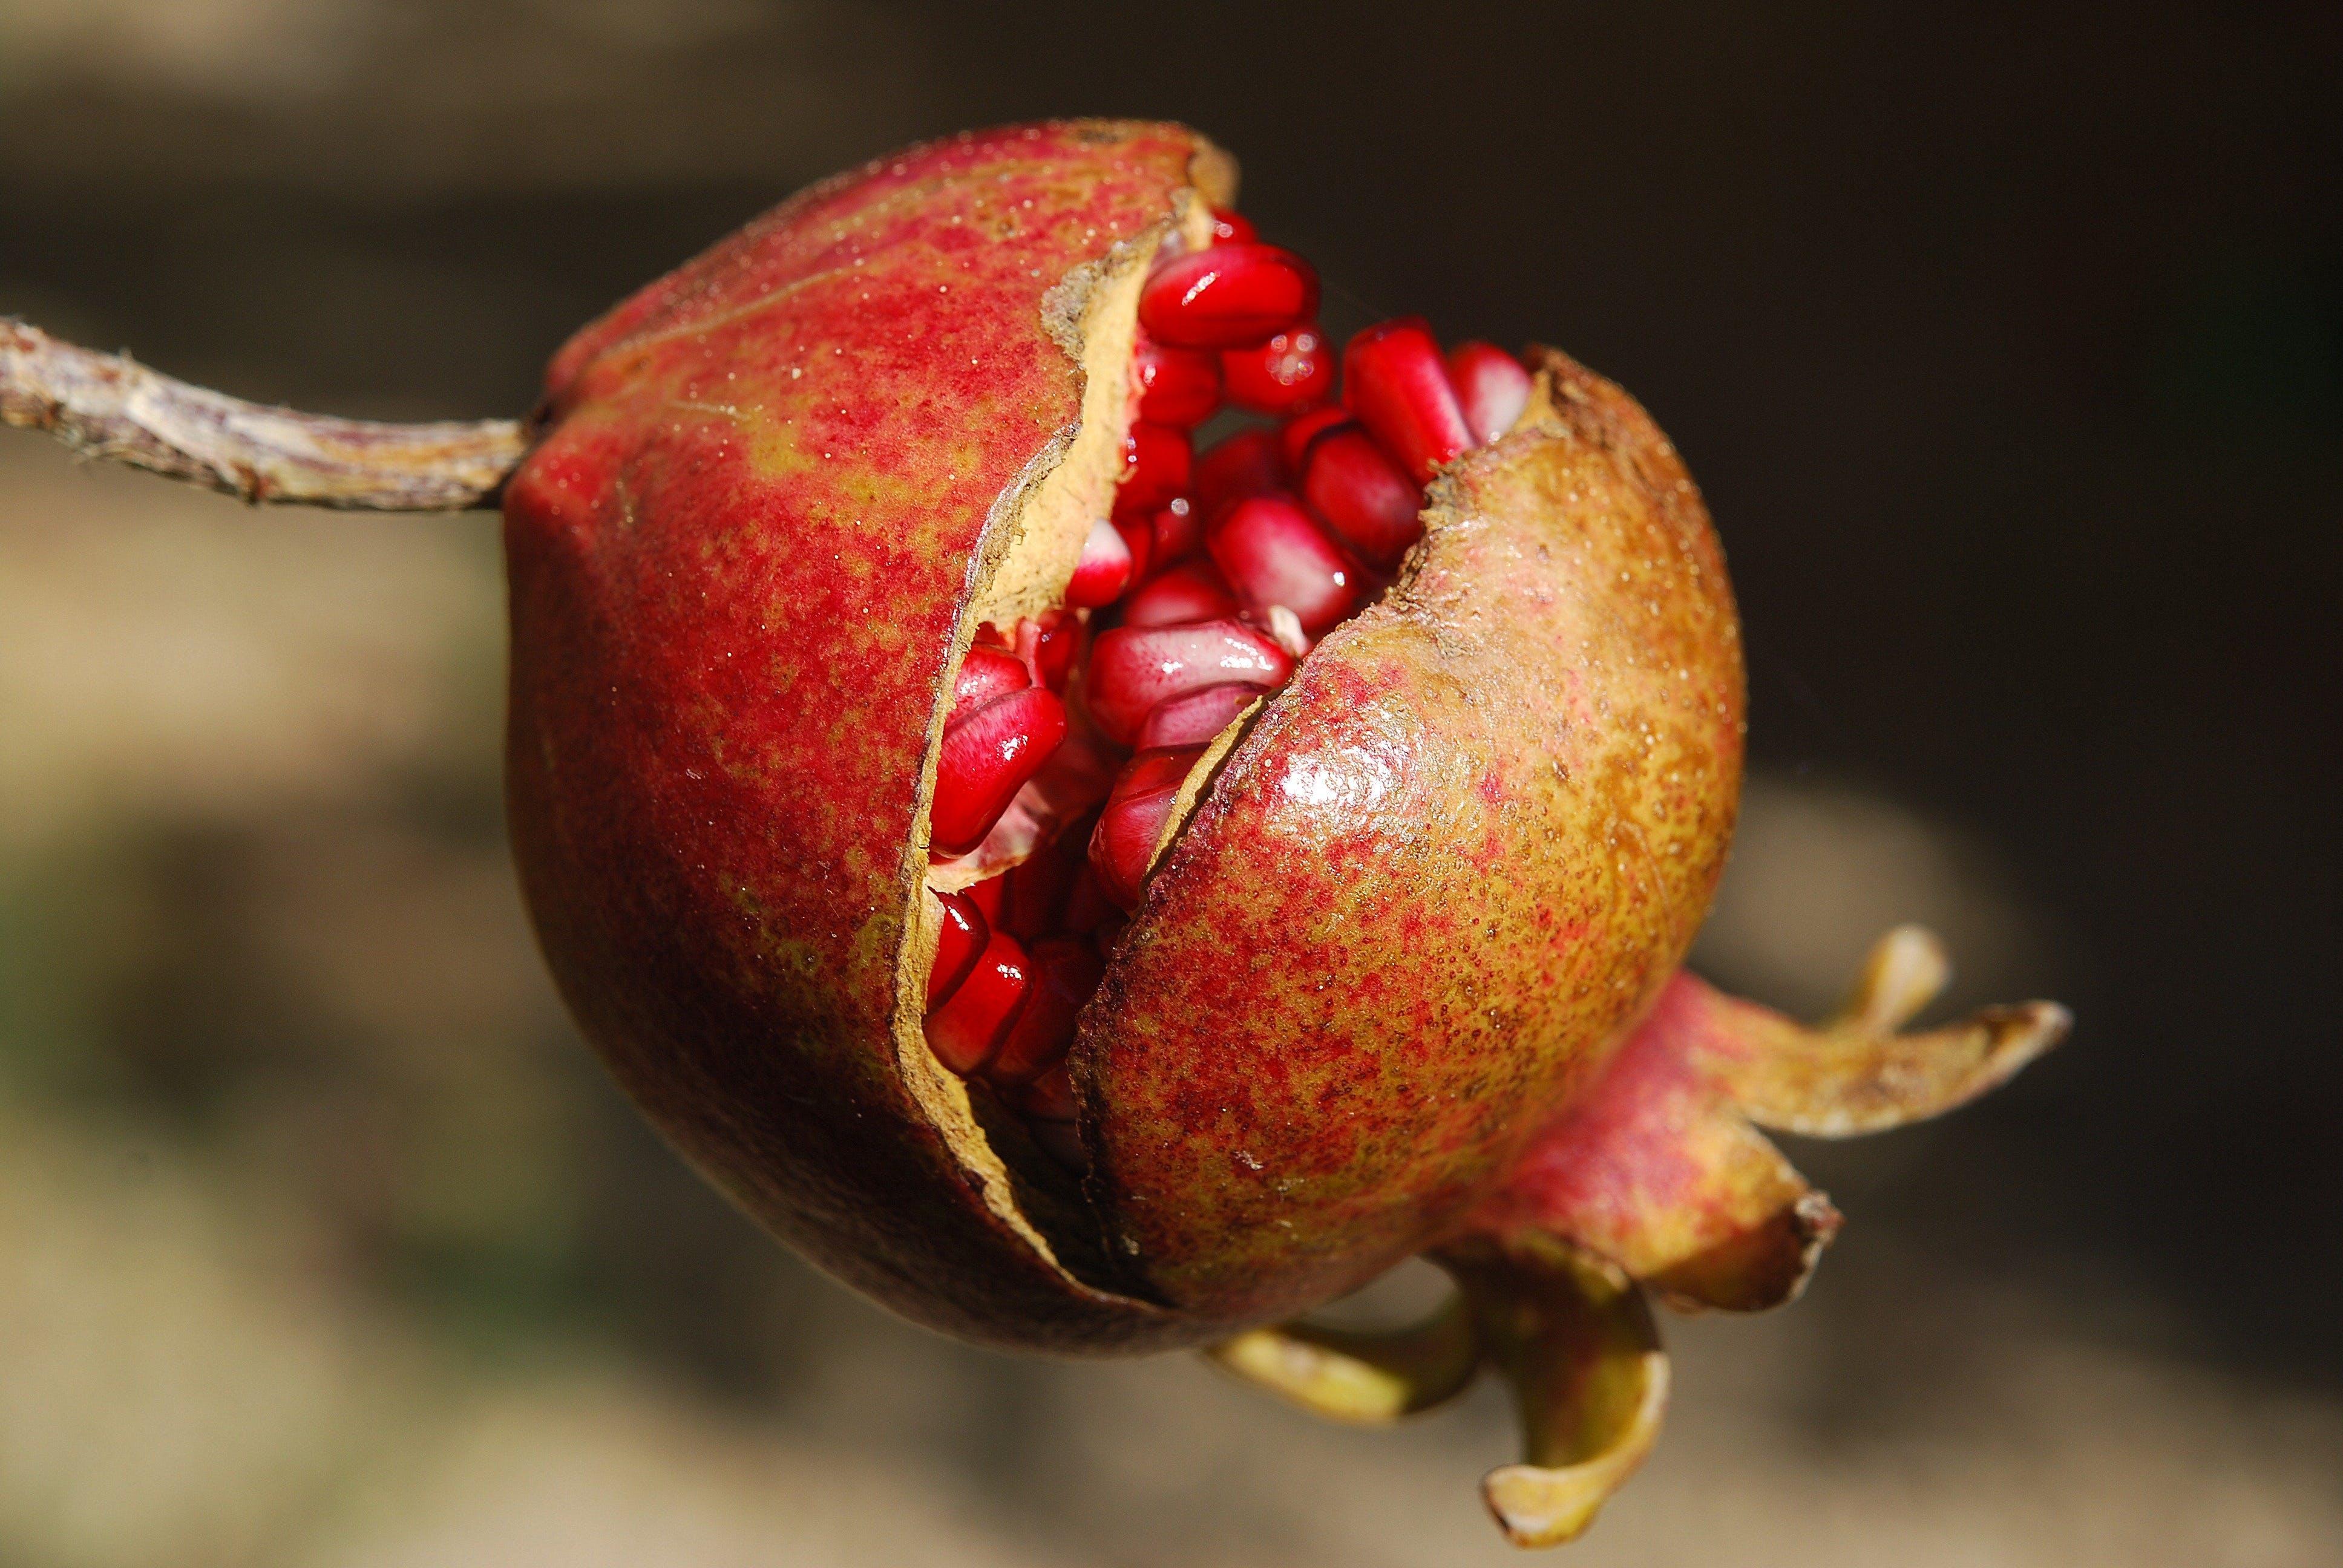 Fotos de stock gratuitas de comida, Fresco, Fruta, granada